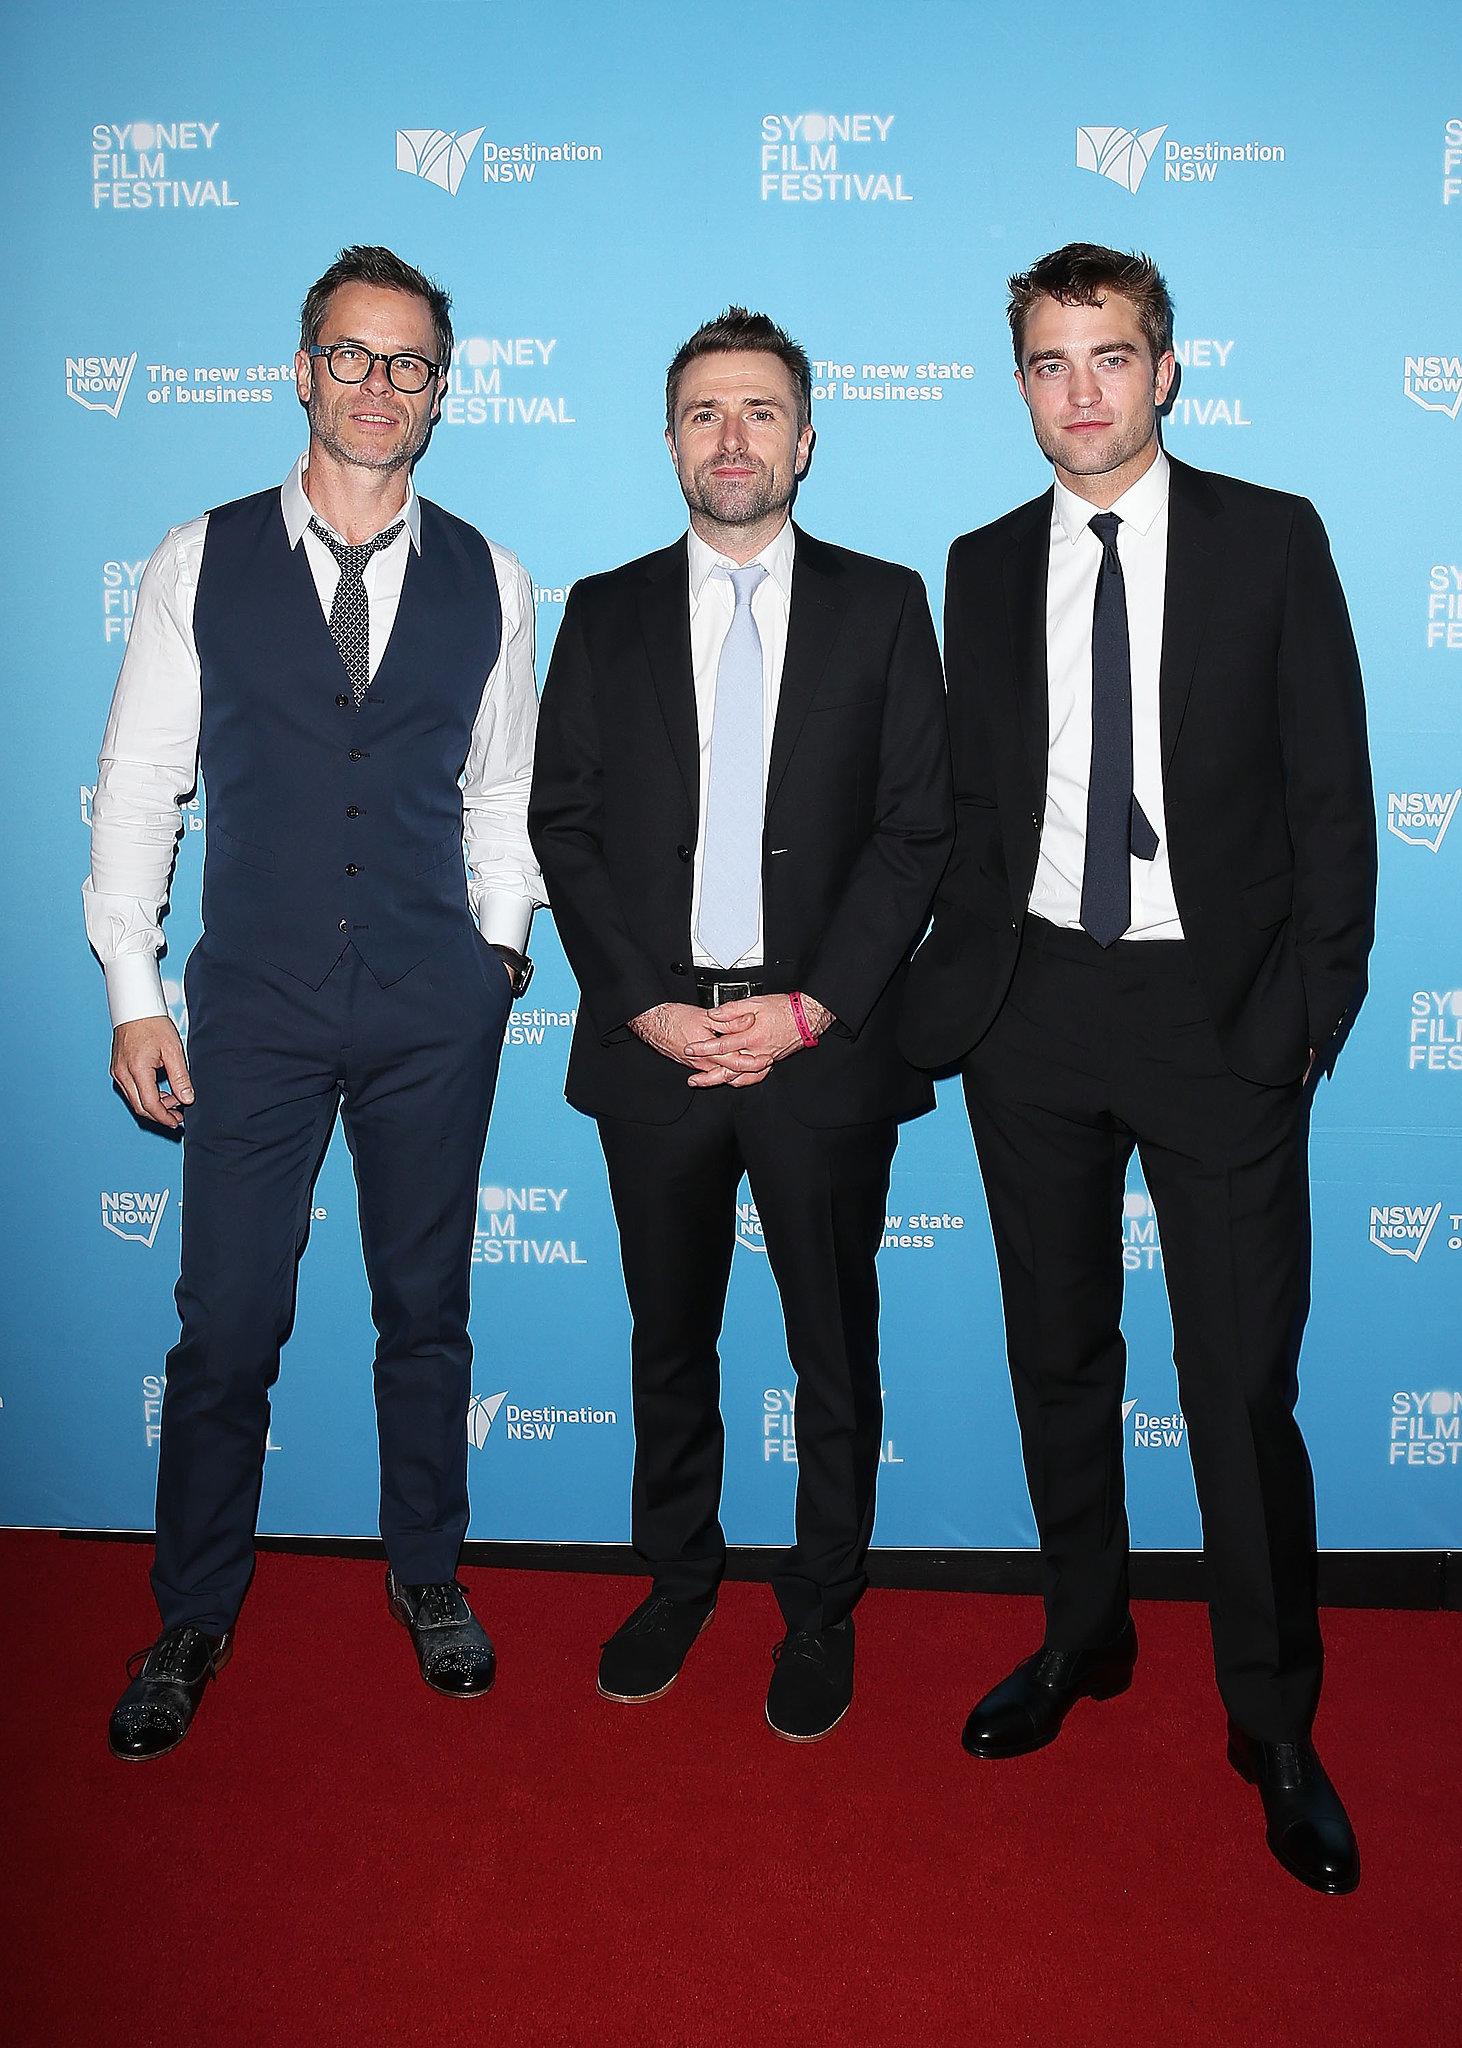 News Flash: Robert Pattinson Still Looks Dreamy From Every Angle